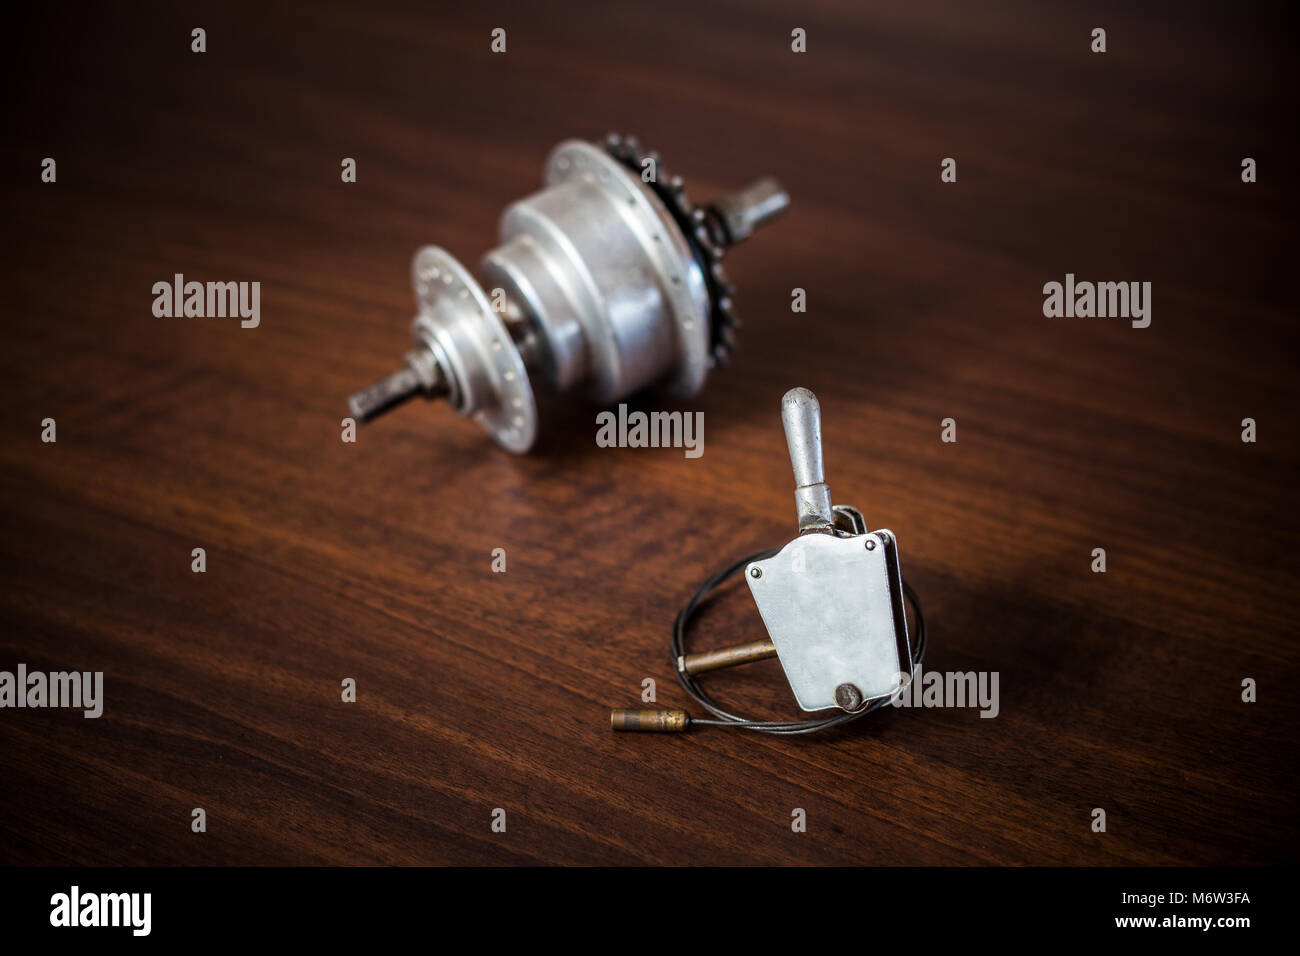 Bicycle Hub Stockfotos & Bicycle Hub Bilder - Alamy